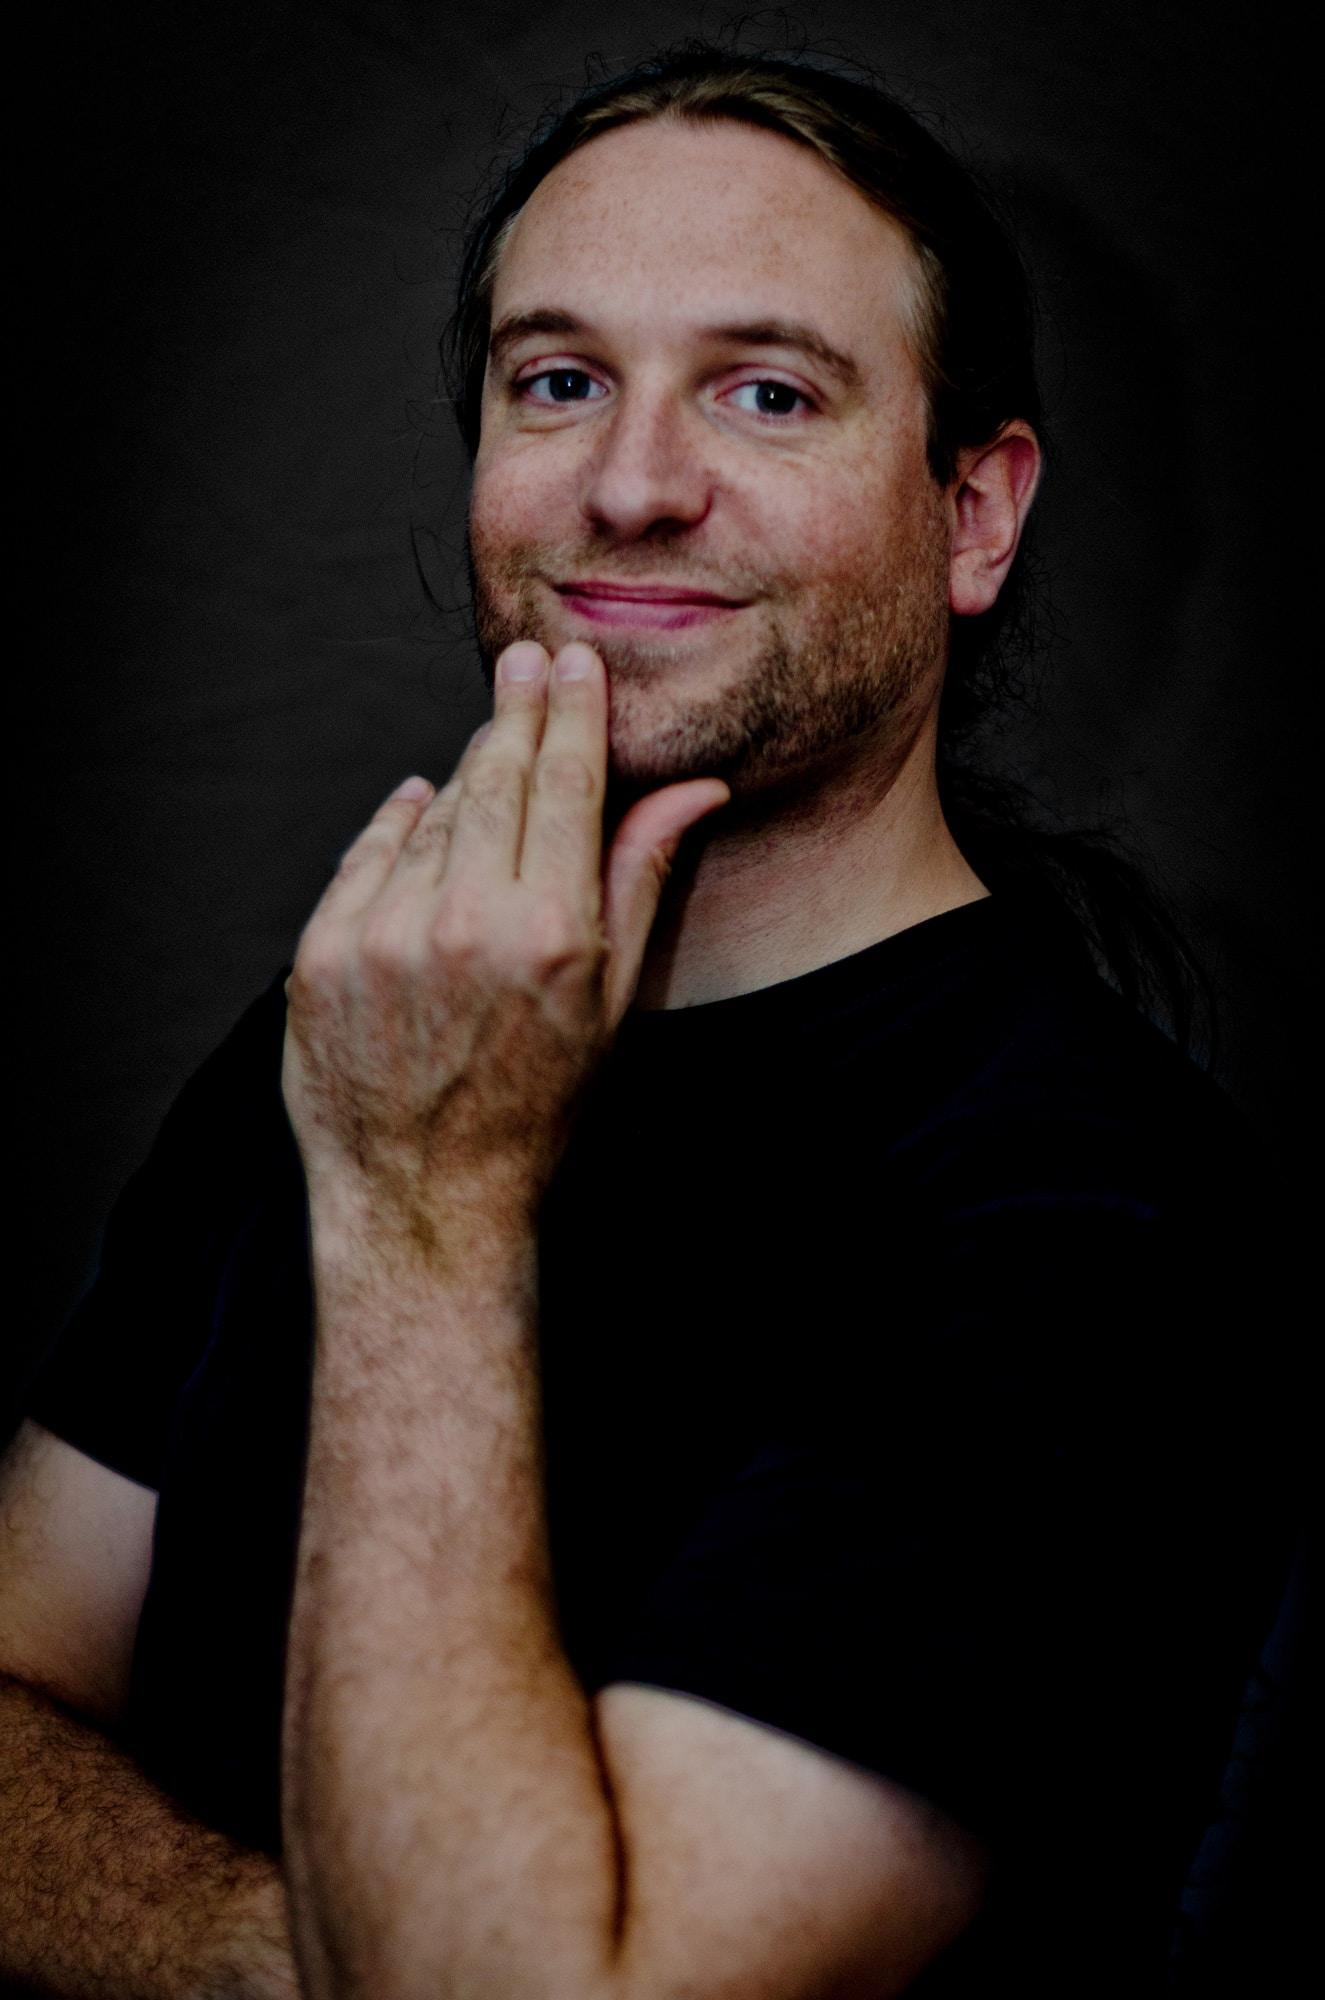 Go to Michael Gröblbauer's profile